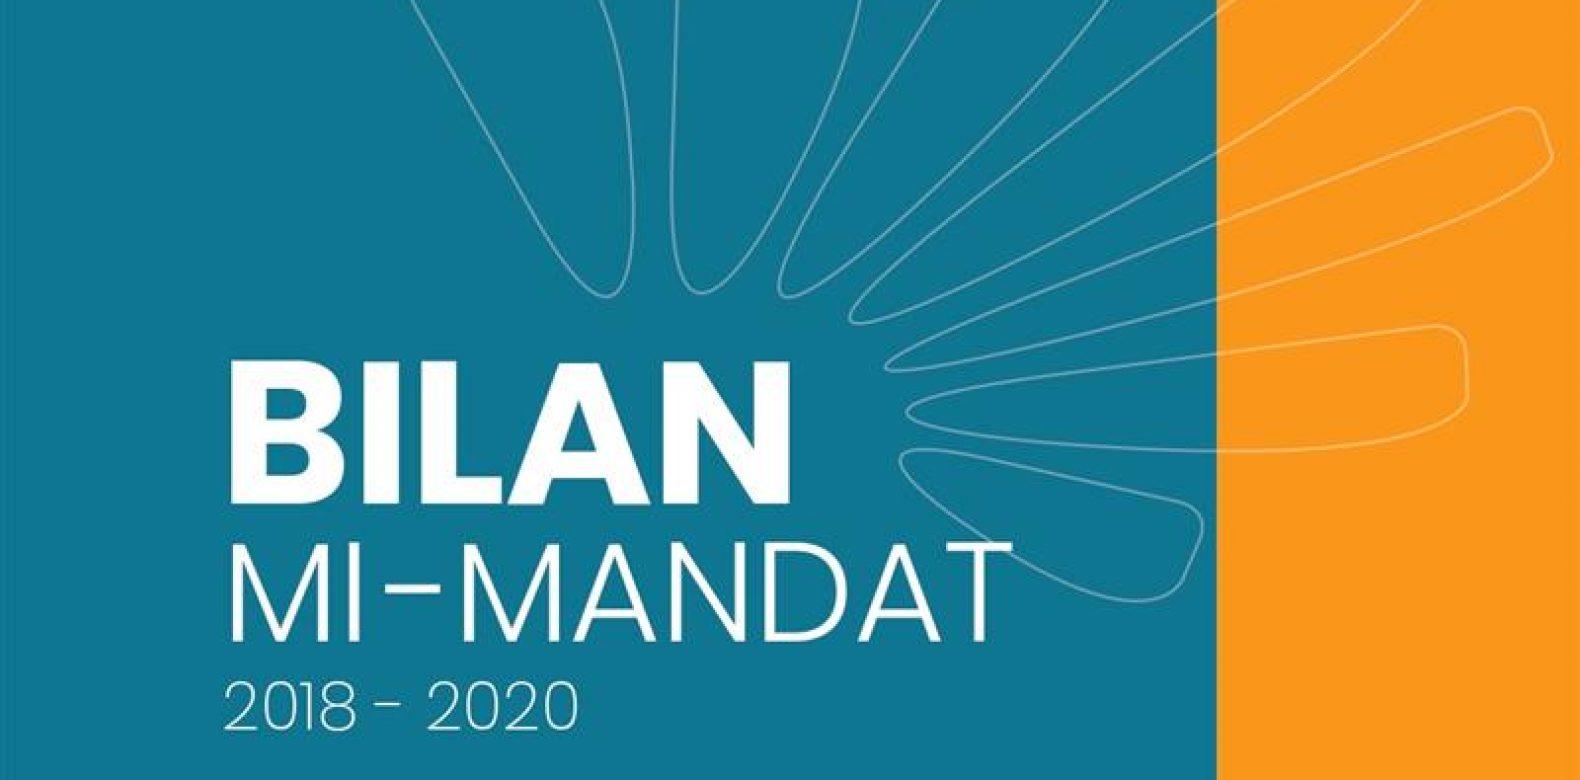 Bilan mi-mandat 2018-2020